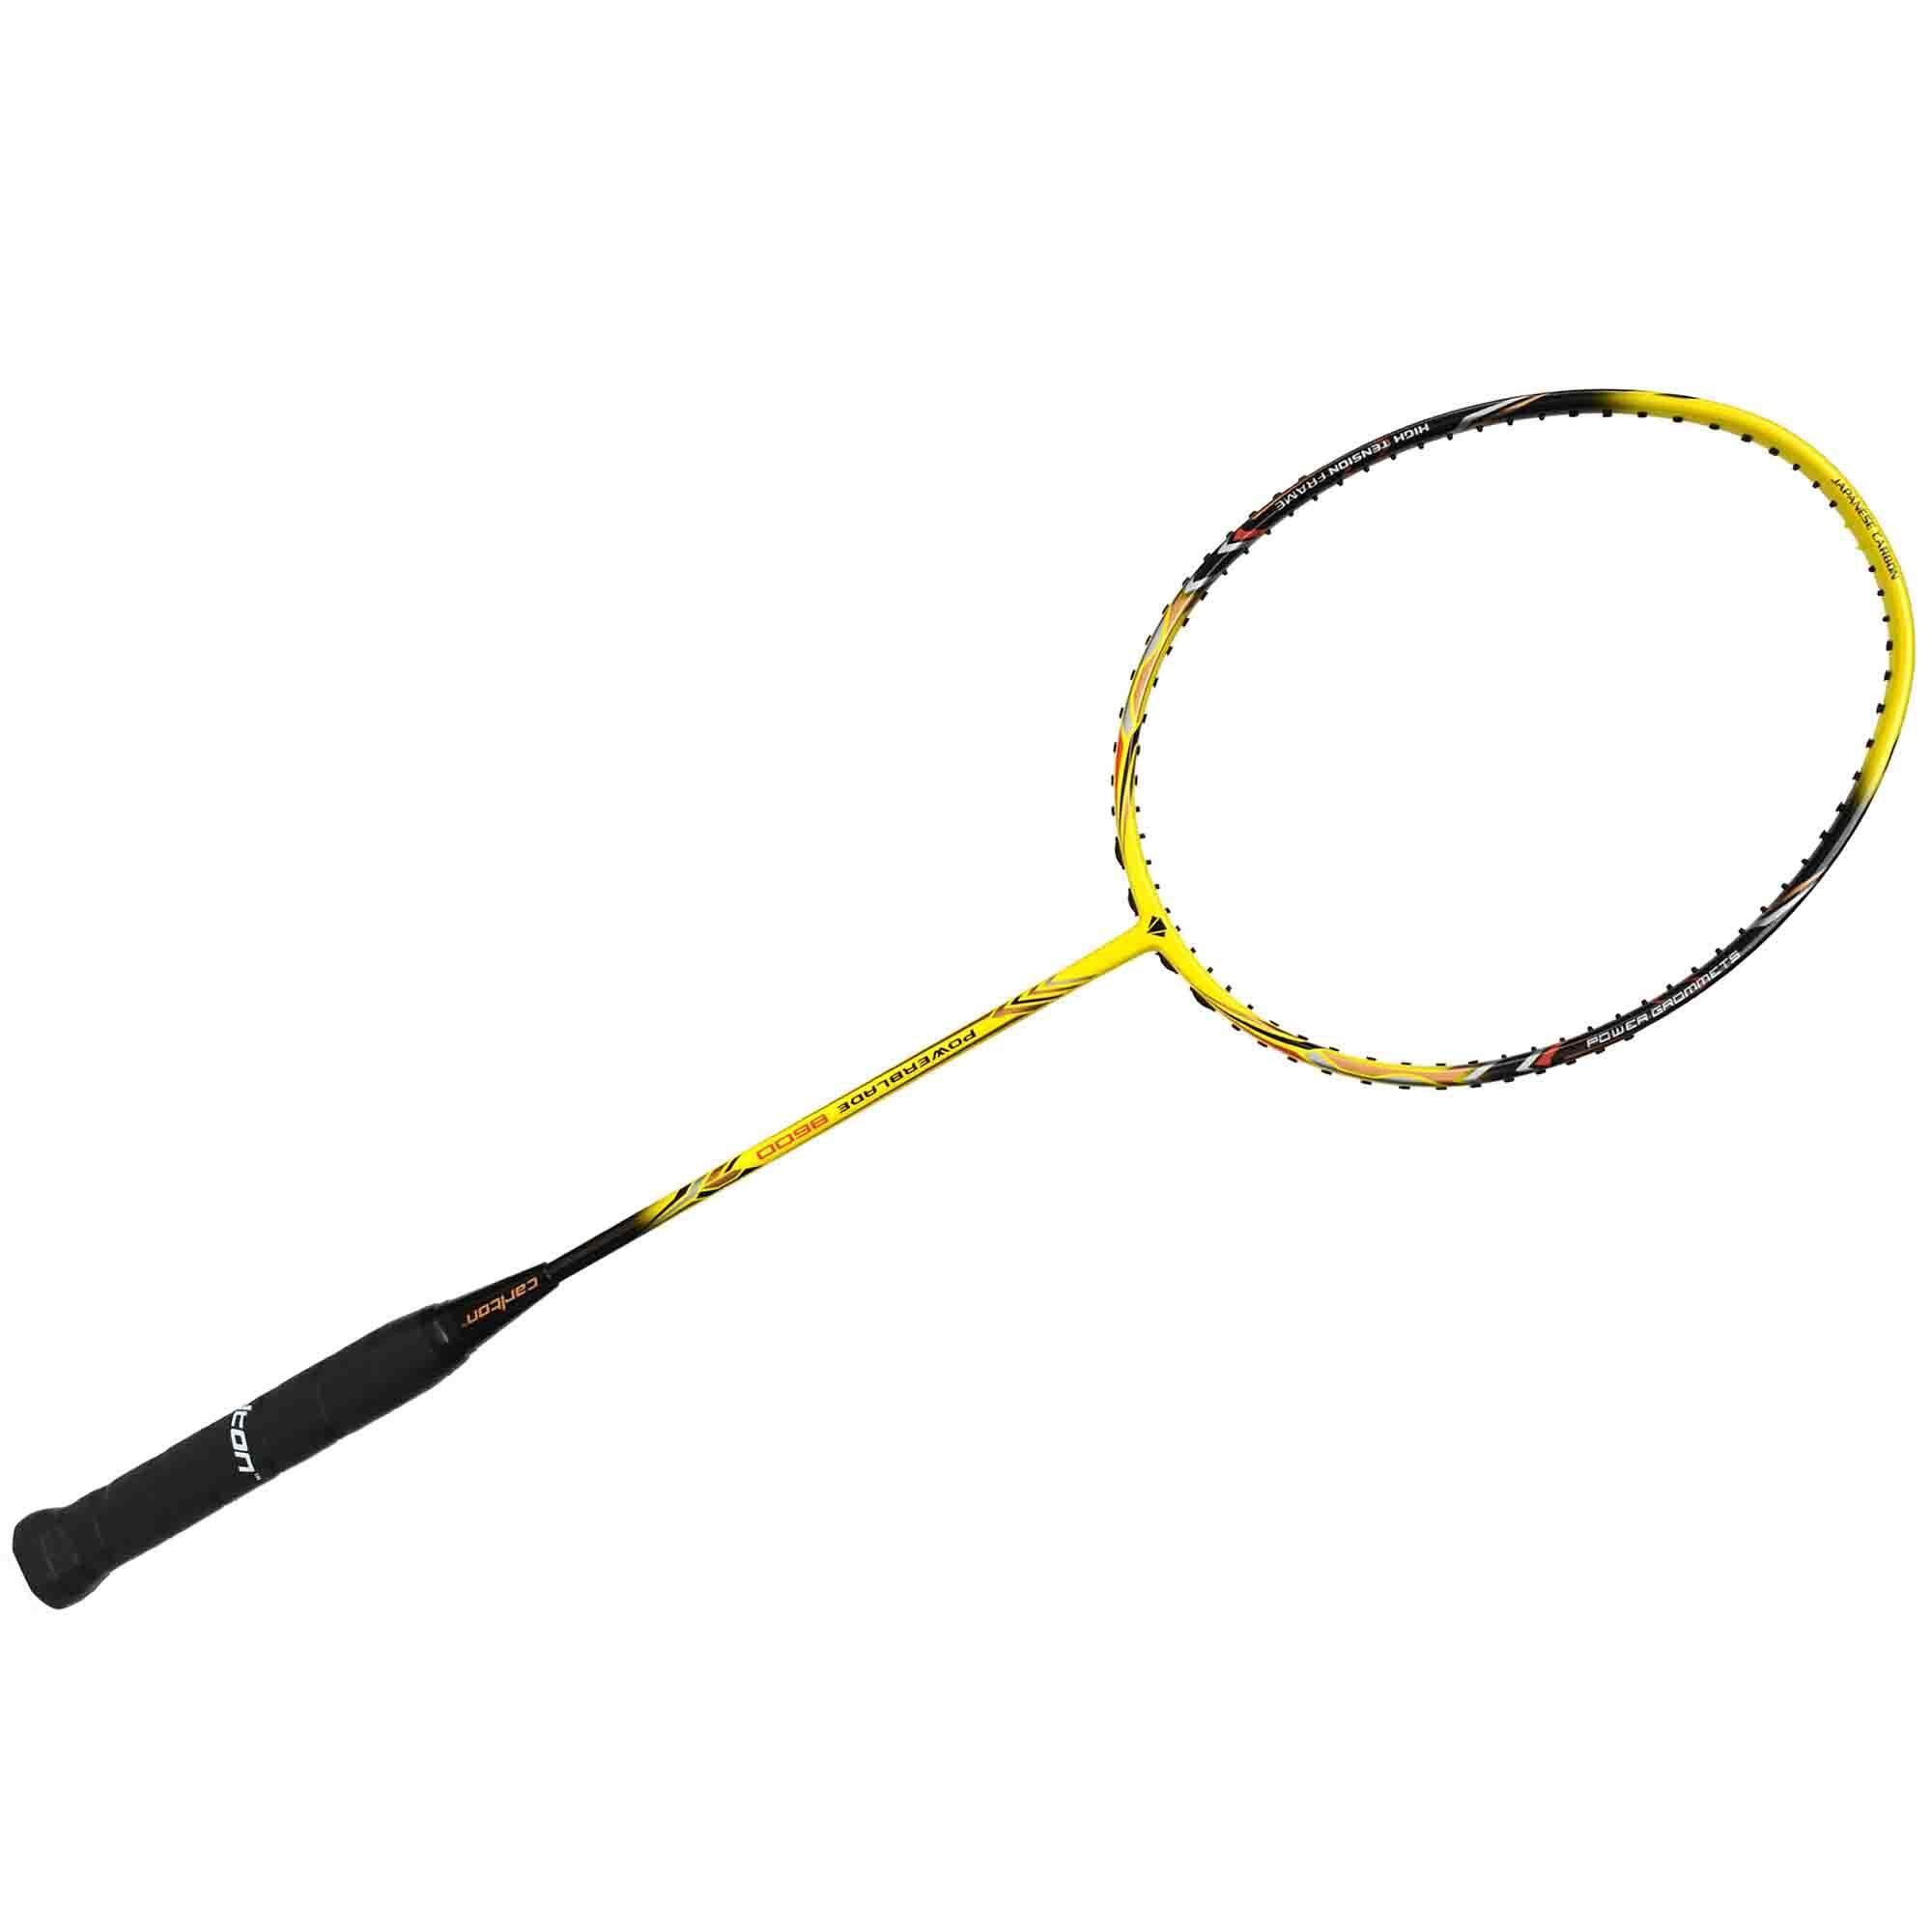 Carlton PowerBlade 8600 Badminton Racket